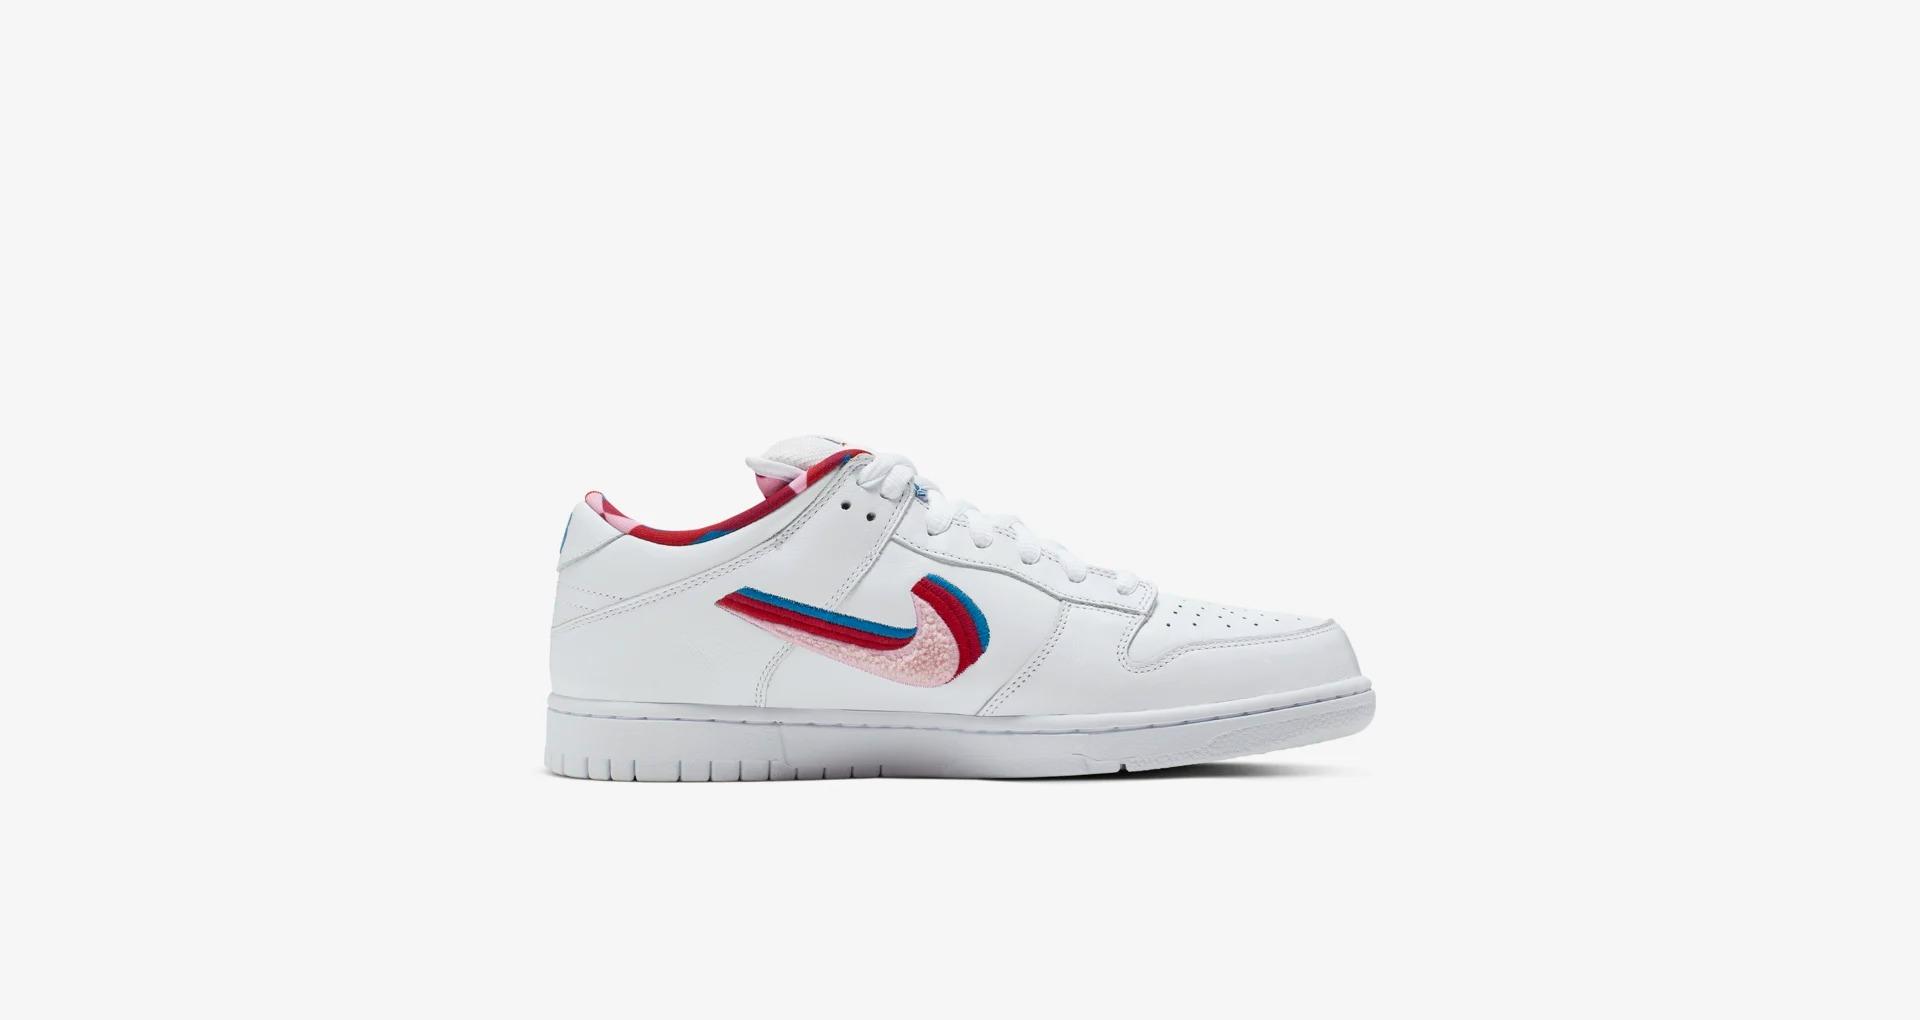 CN4504 100 Parra x Nike SB Dunk Low 2